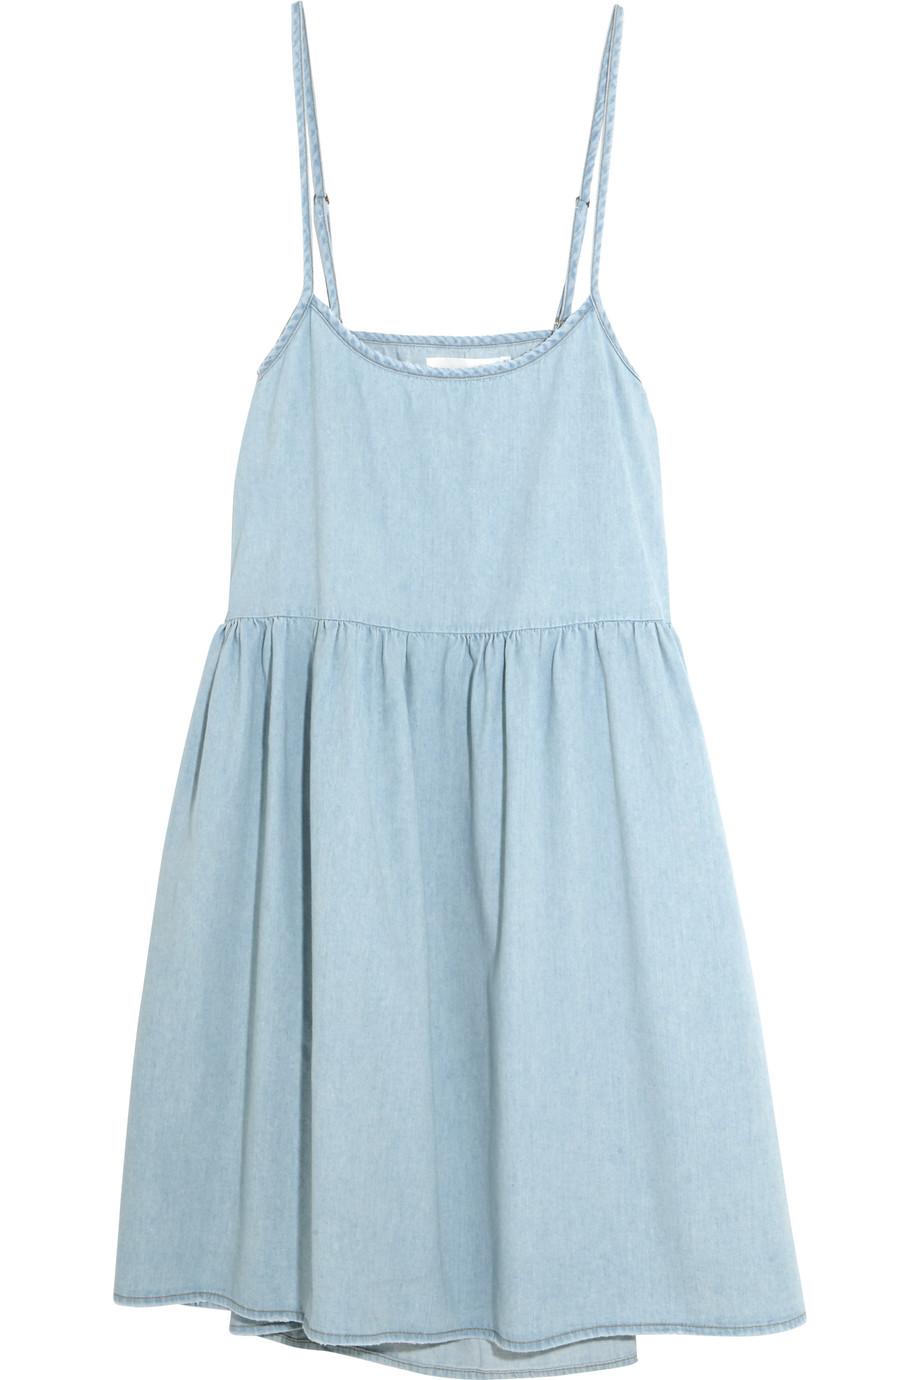 Denim Dress, Light Denim, Women's, Size: 3